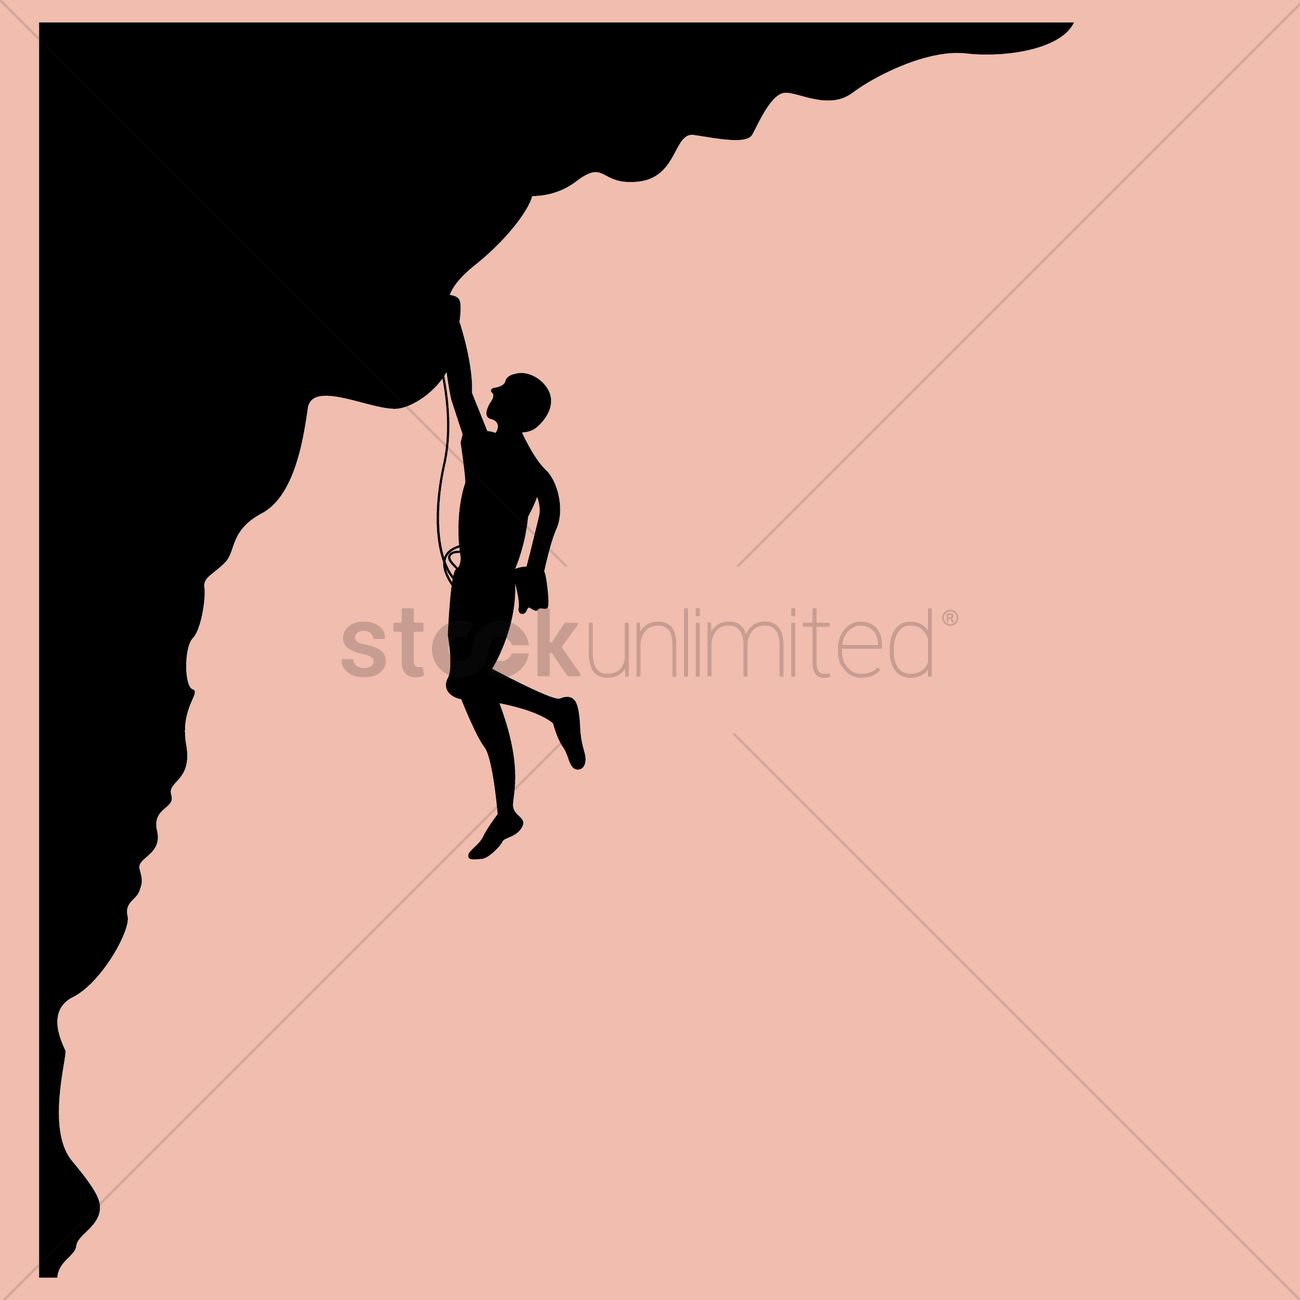 1300x1300 Silhouette Of Man Climbing Mountain Vector Image